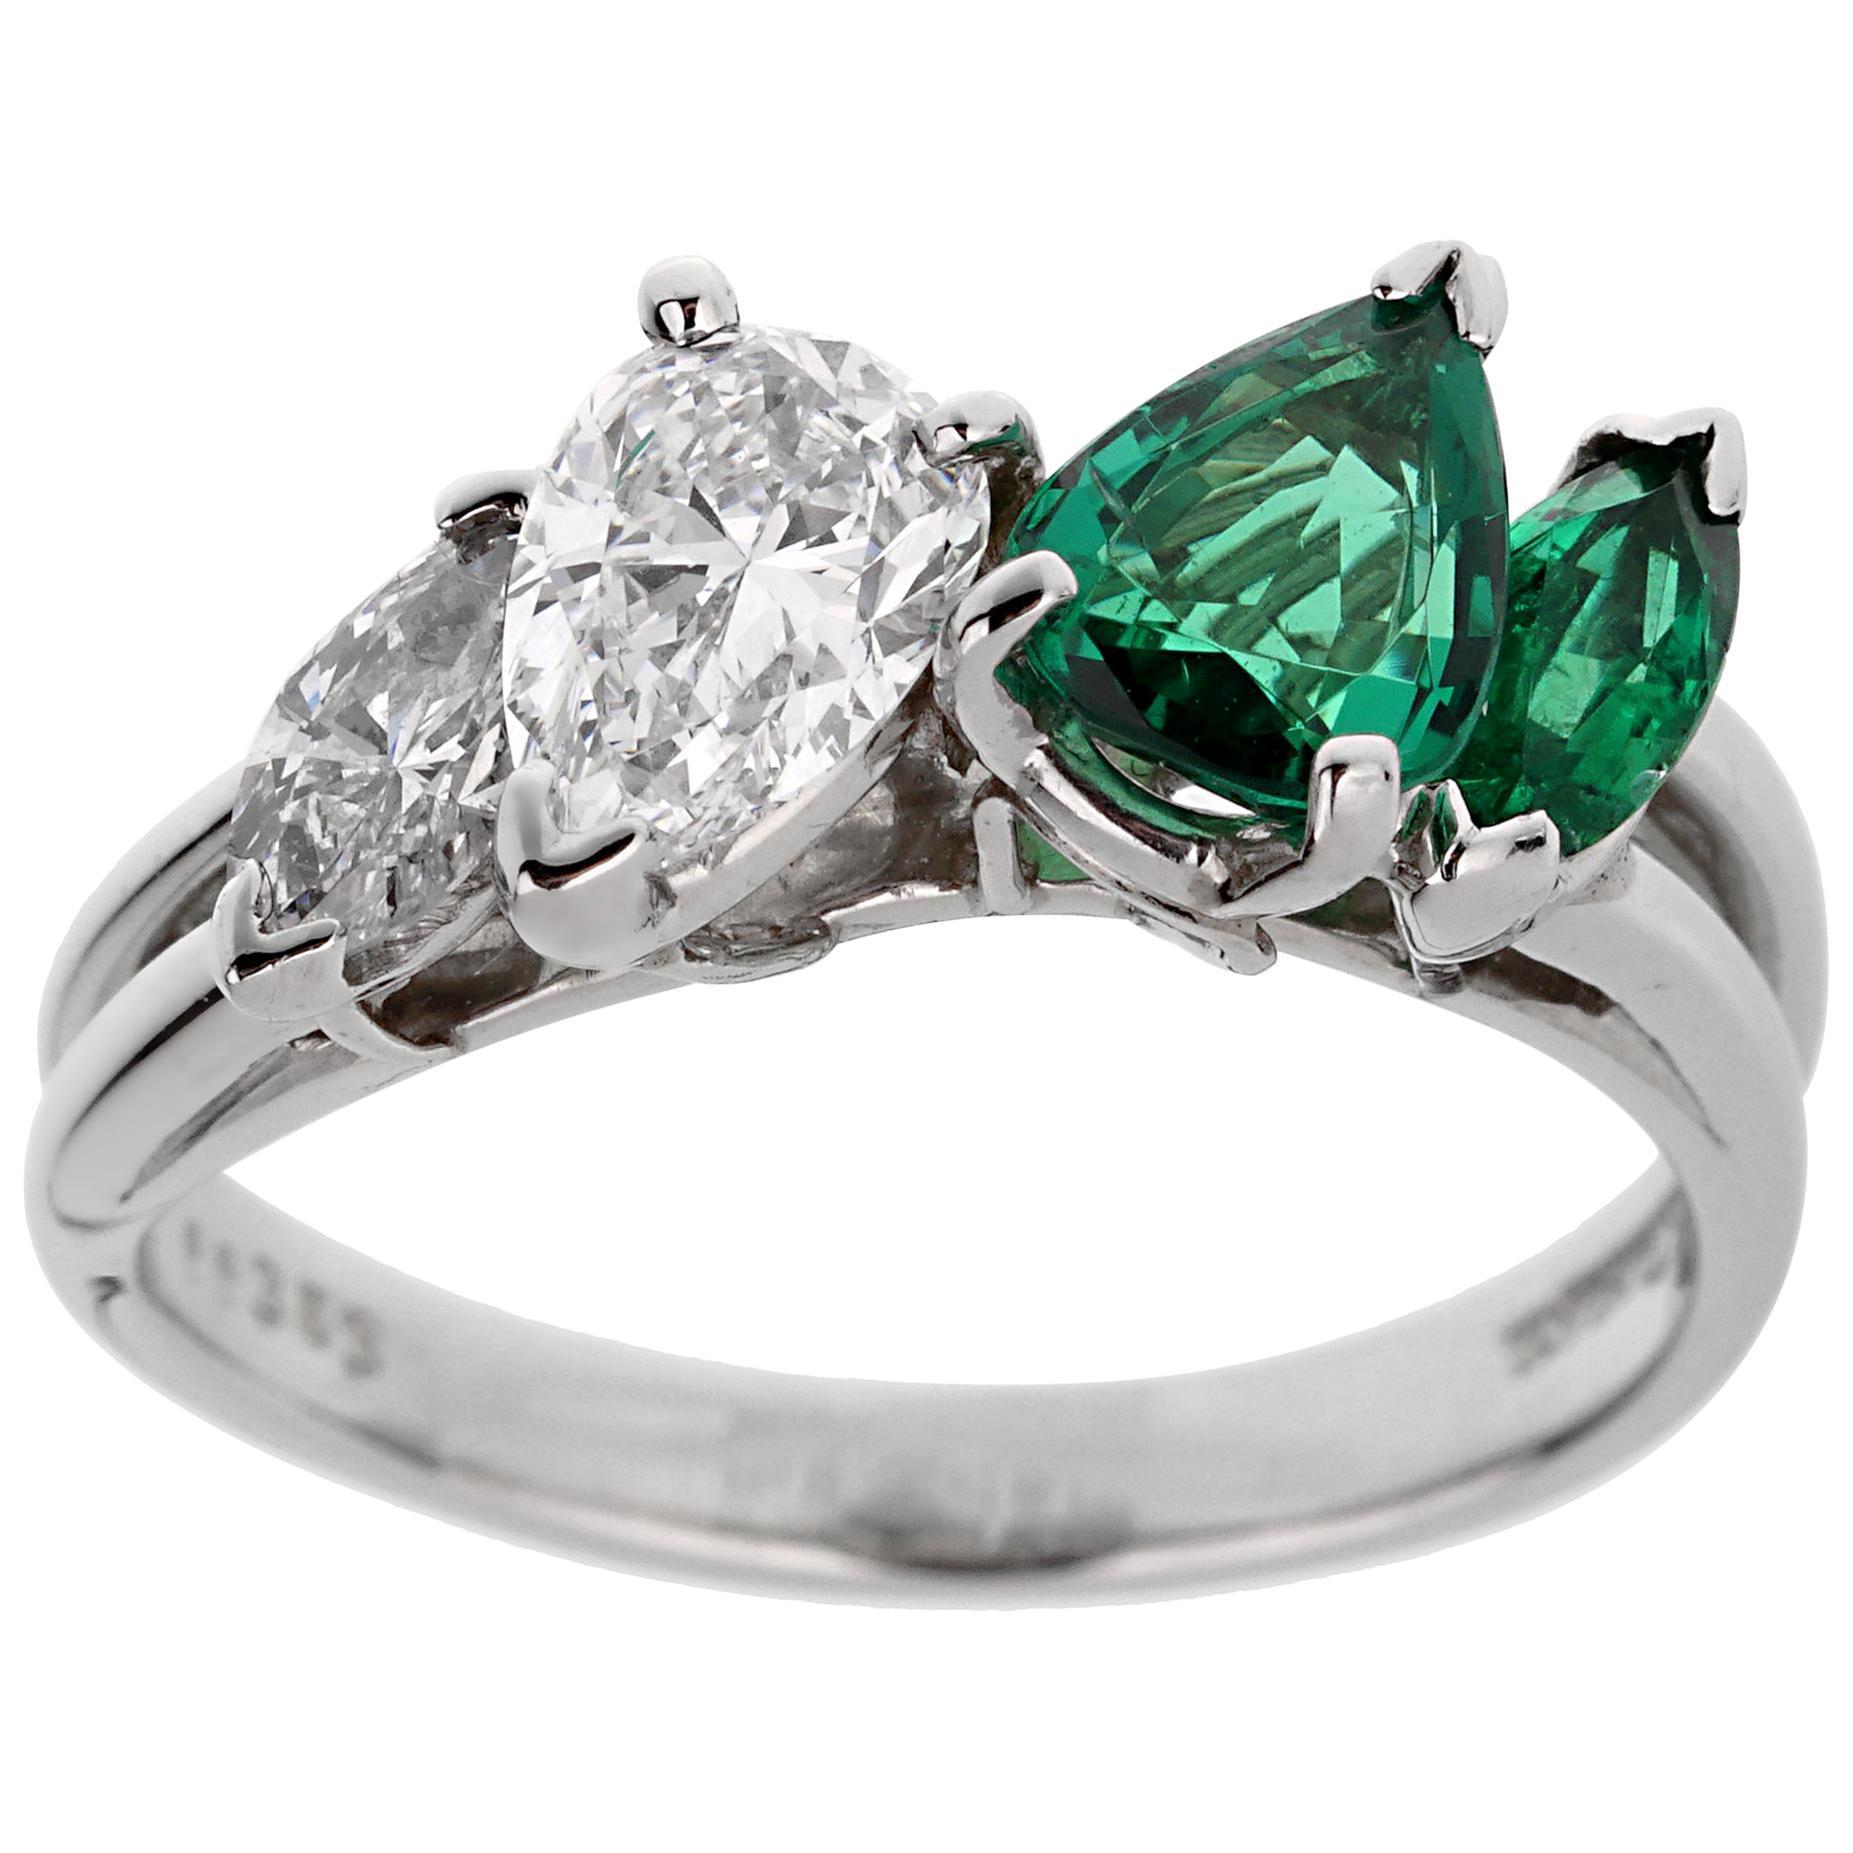 Oscar Heyman GIA Certified Vintage Emerald Diamond Cocktail Ring